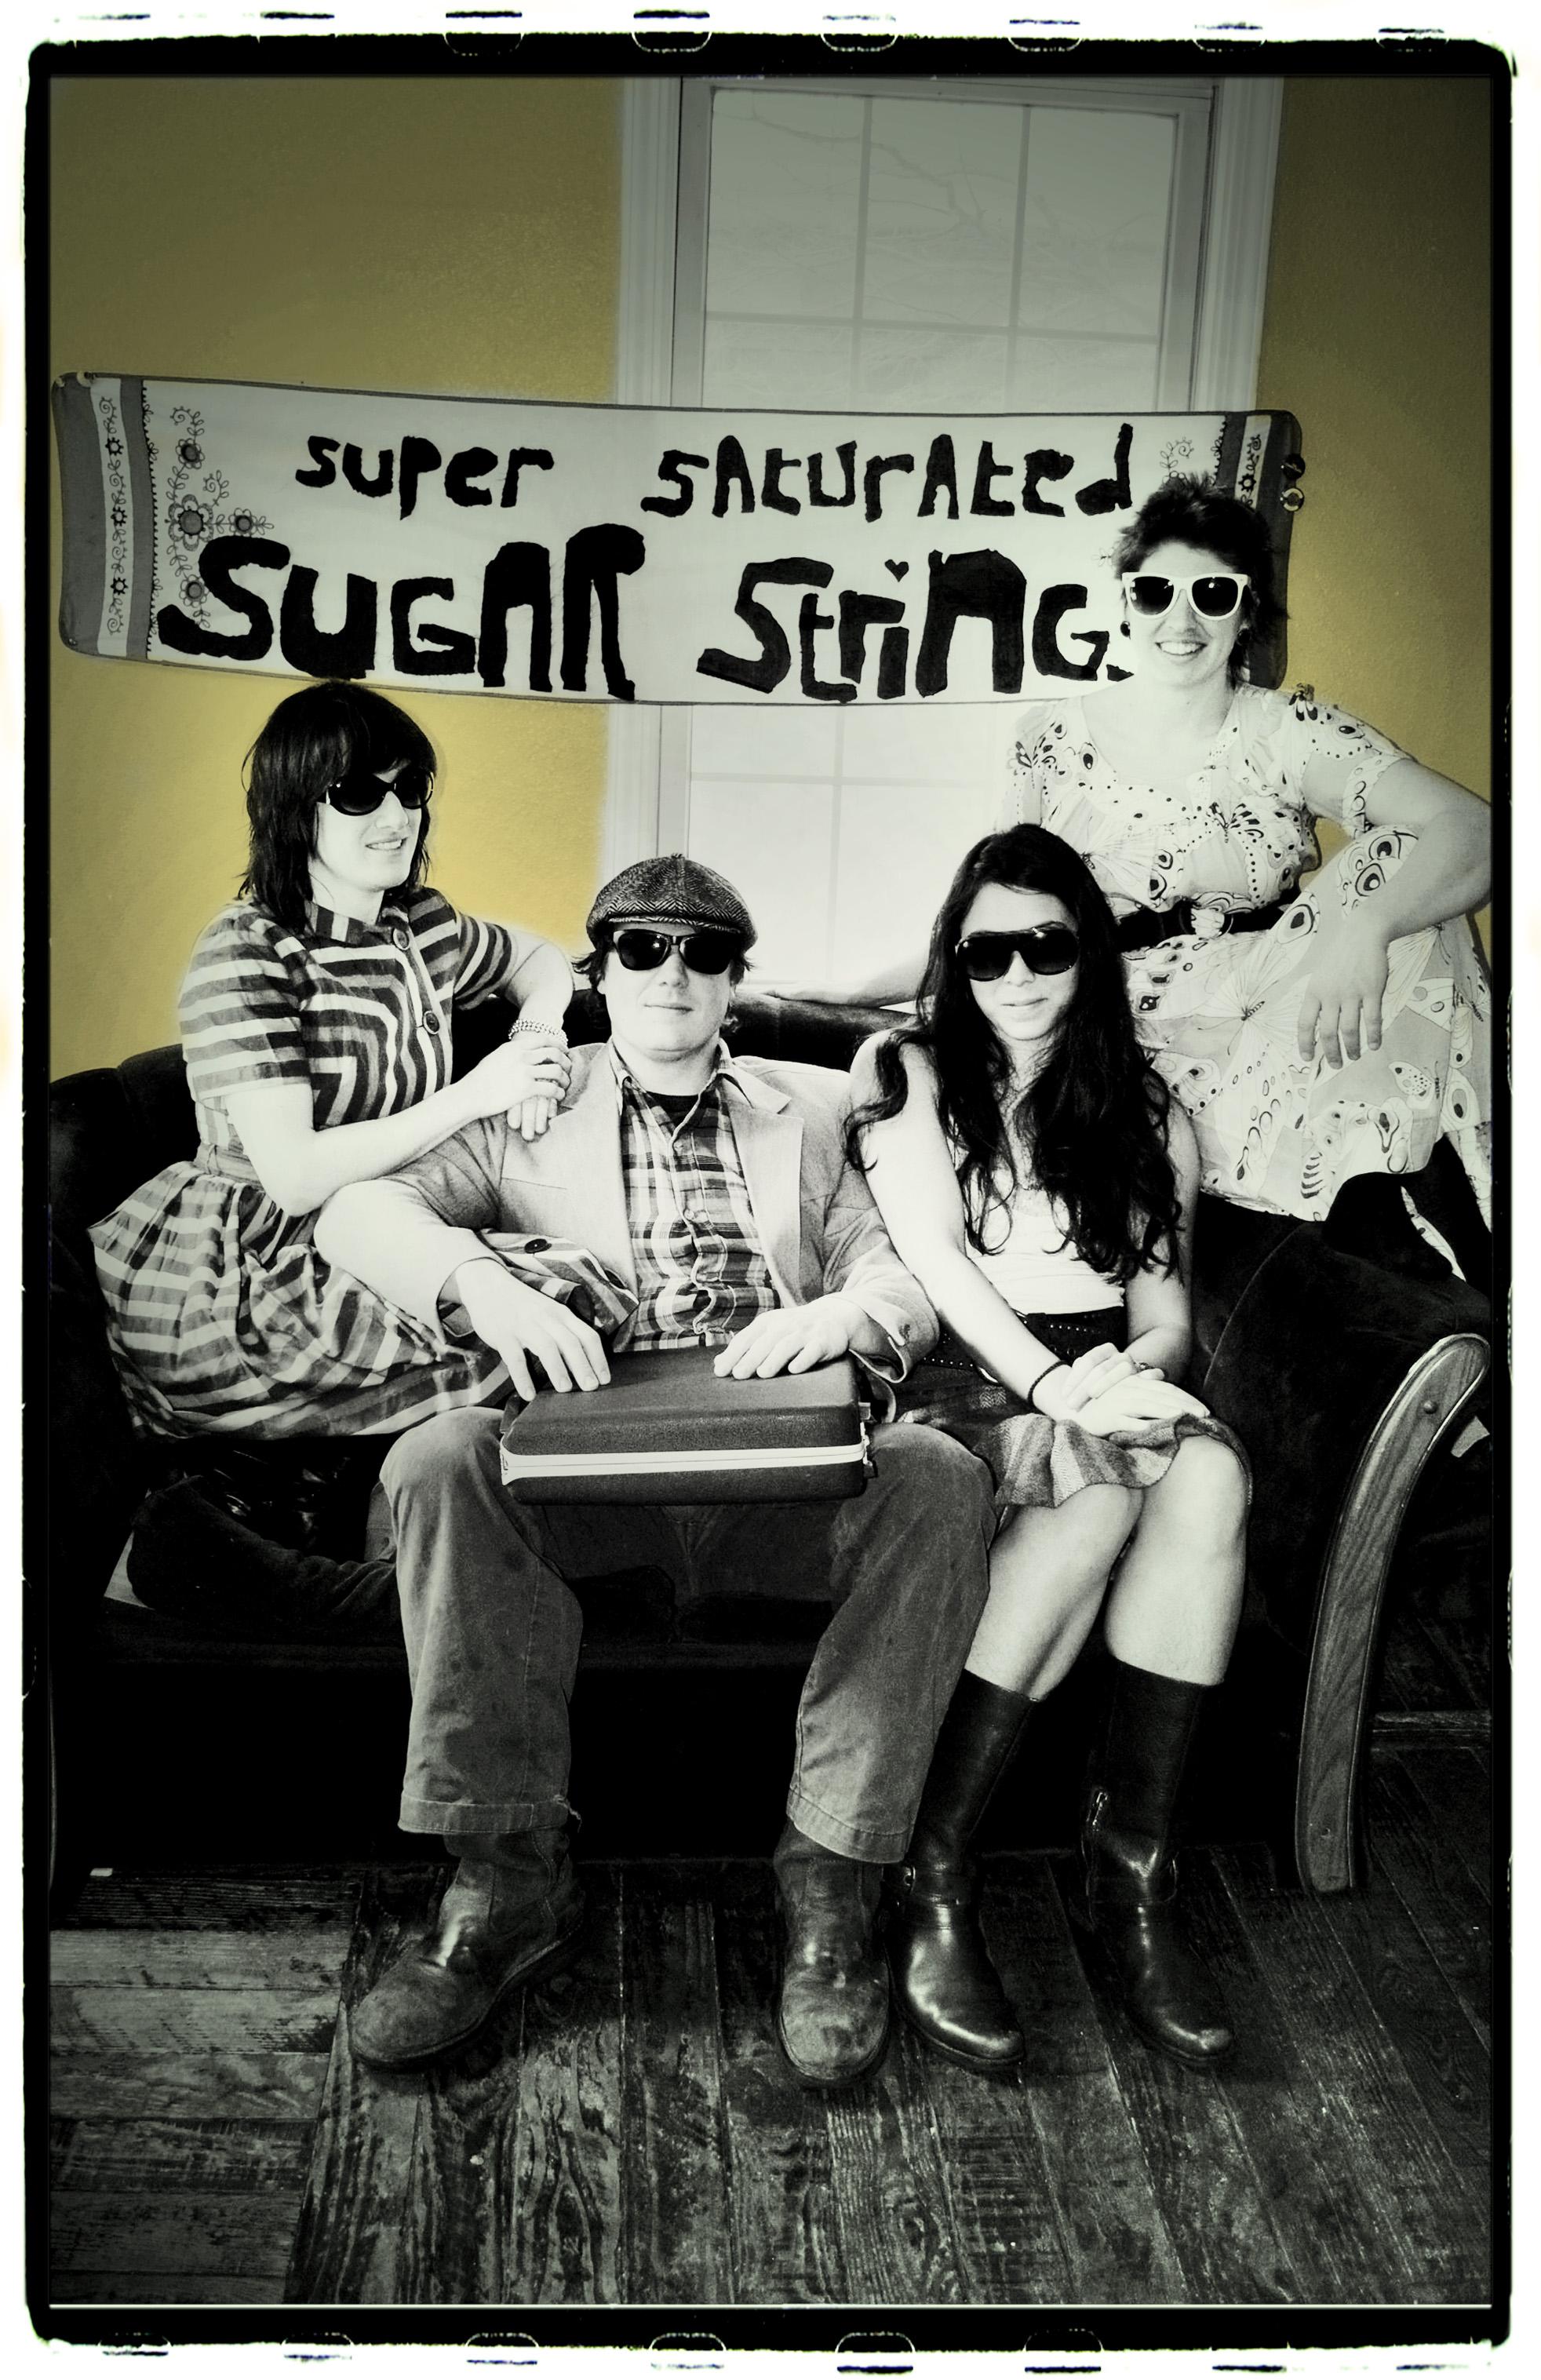 SugarSnakes